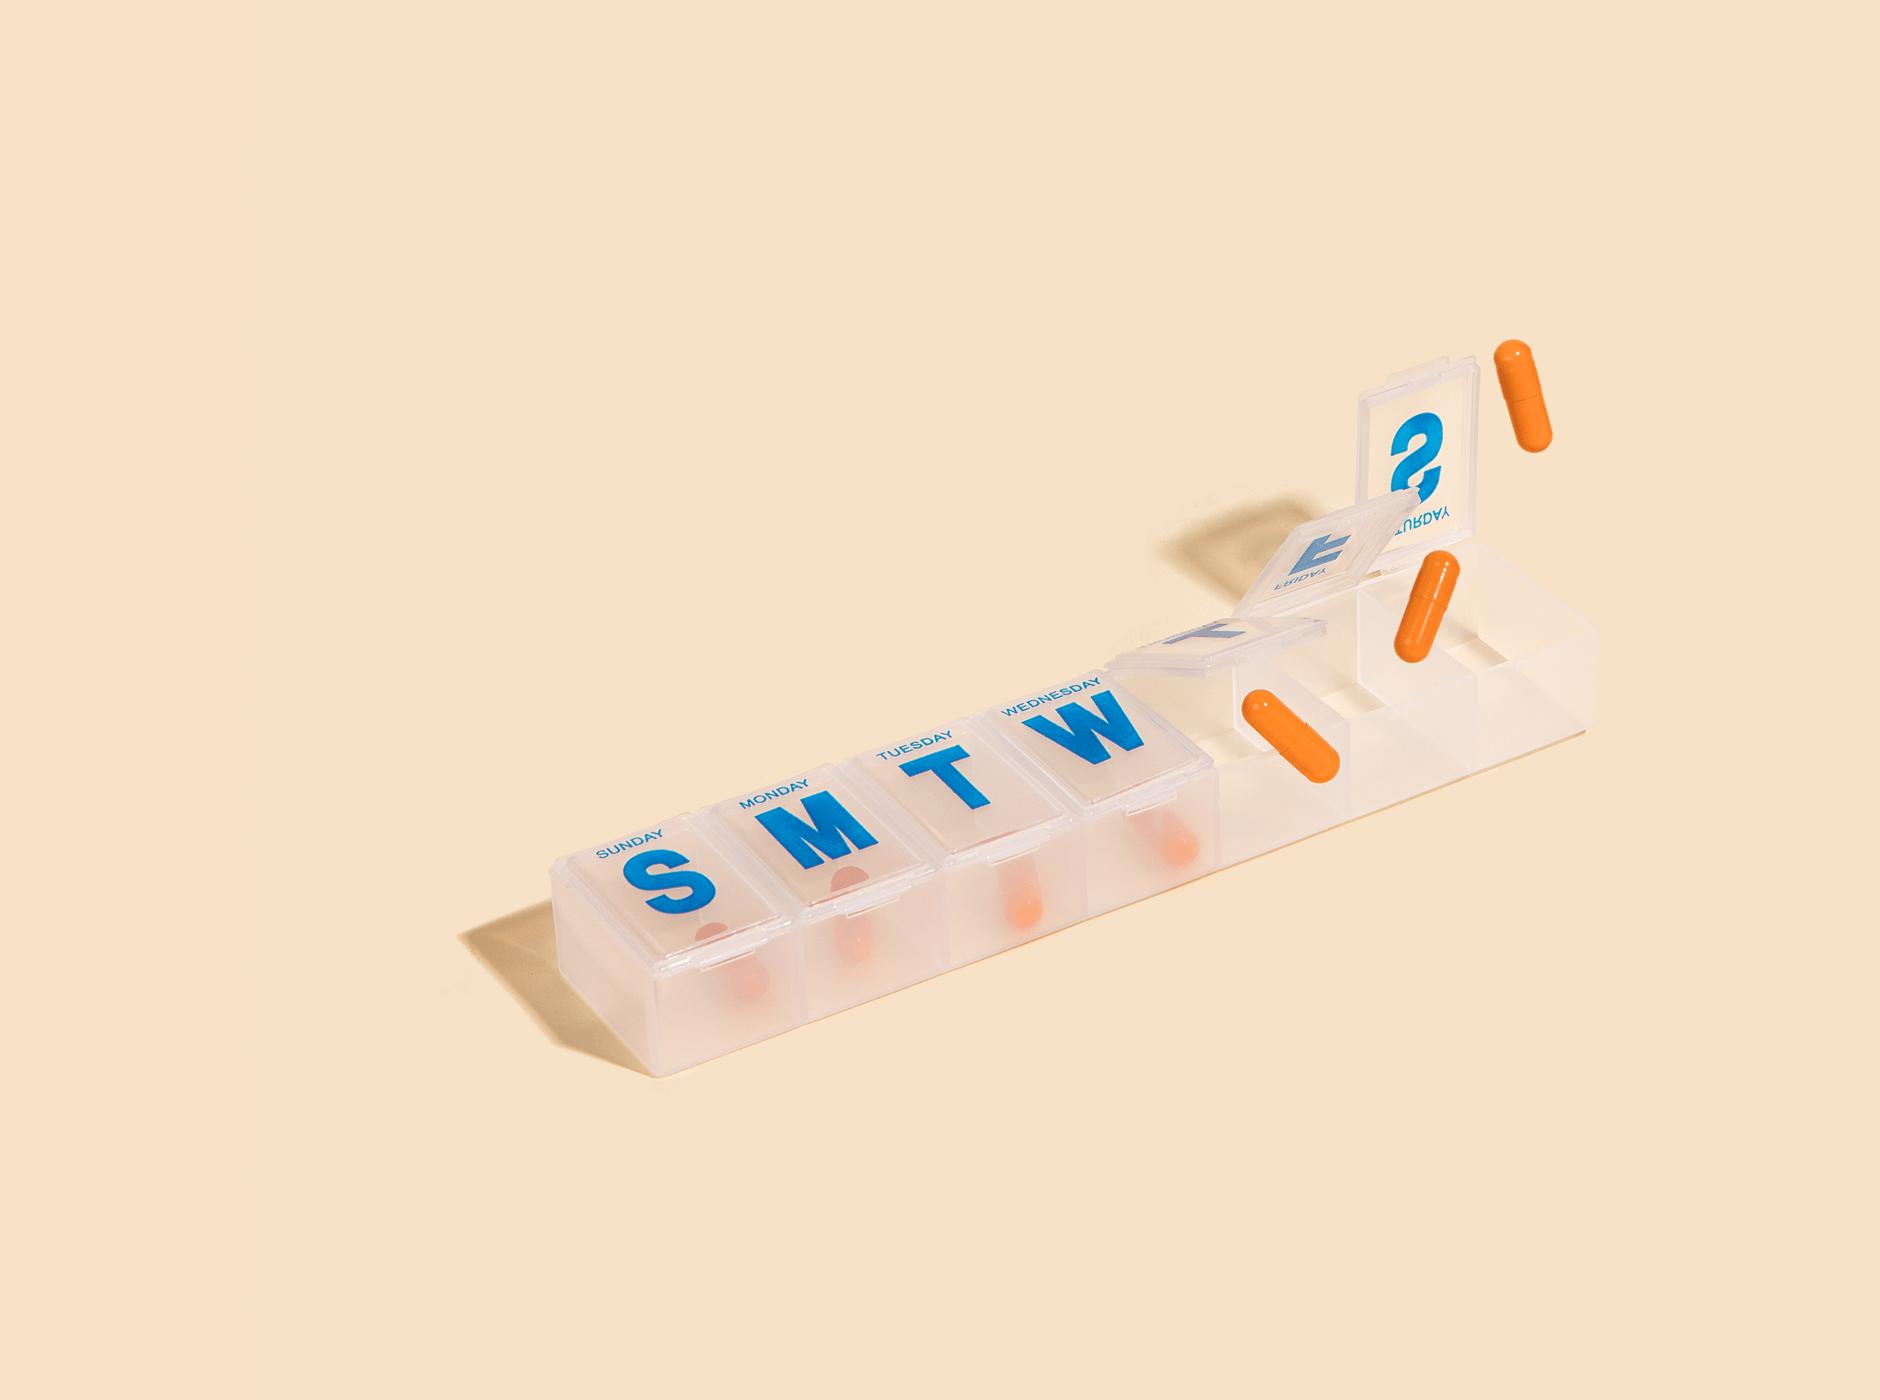 Pill box with orange pills inside.